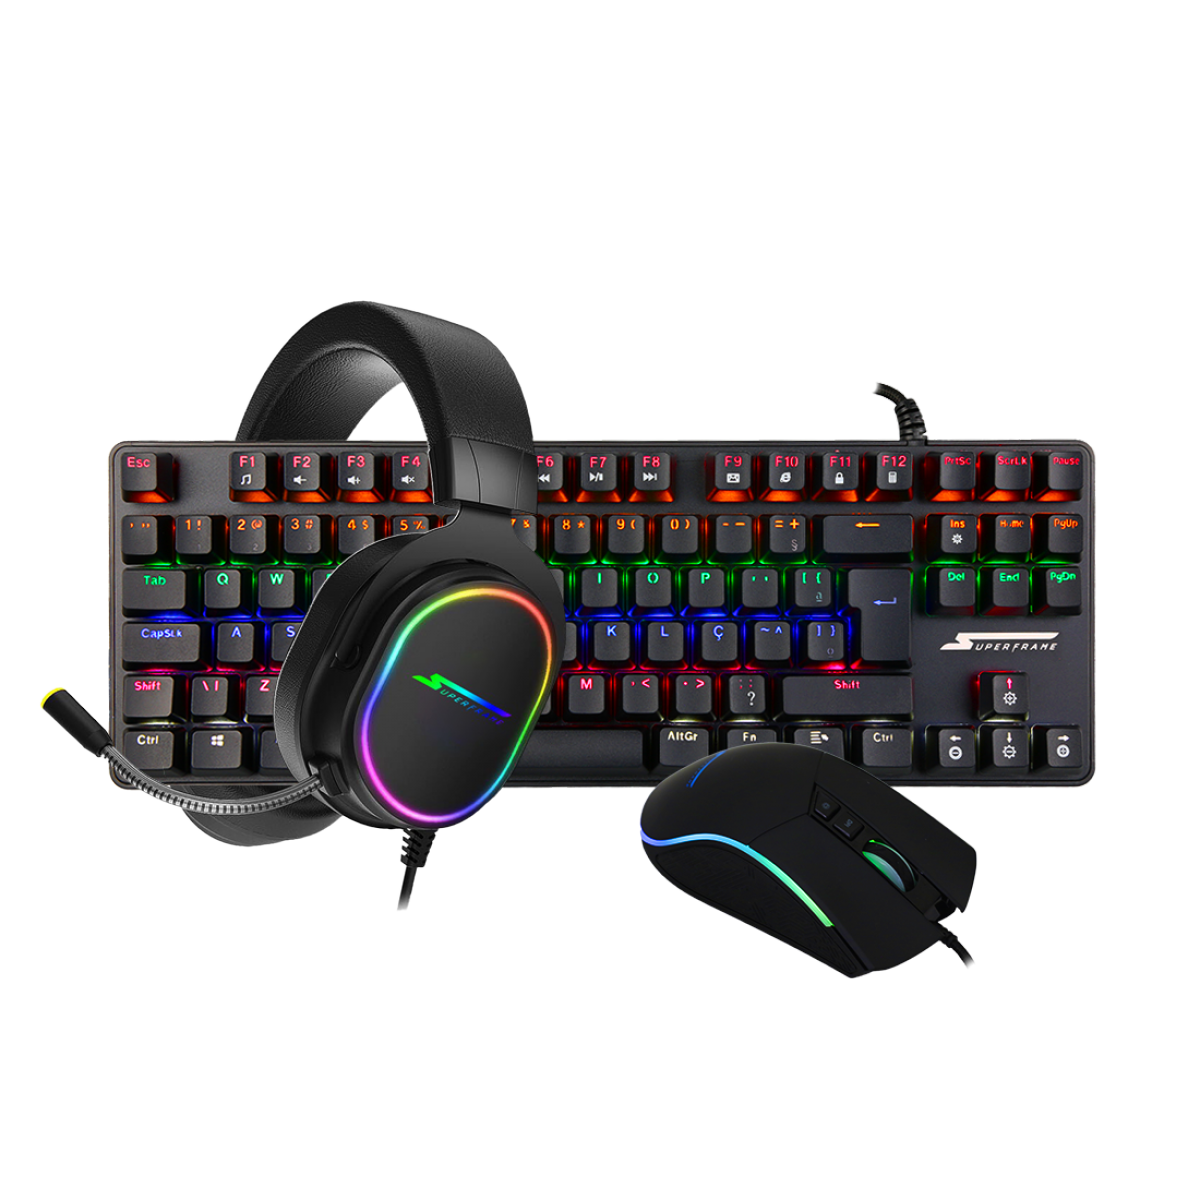 Combo Gamer SuperFrame, Teclado Mecânico Champion + Mouse Gamer Boss + Headset Gamer Velka